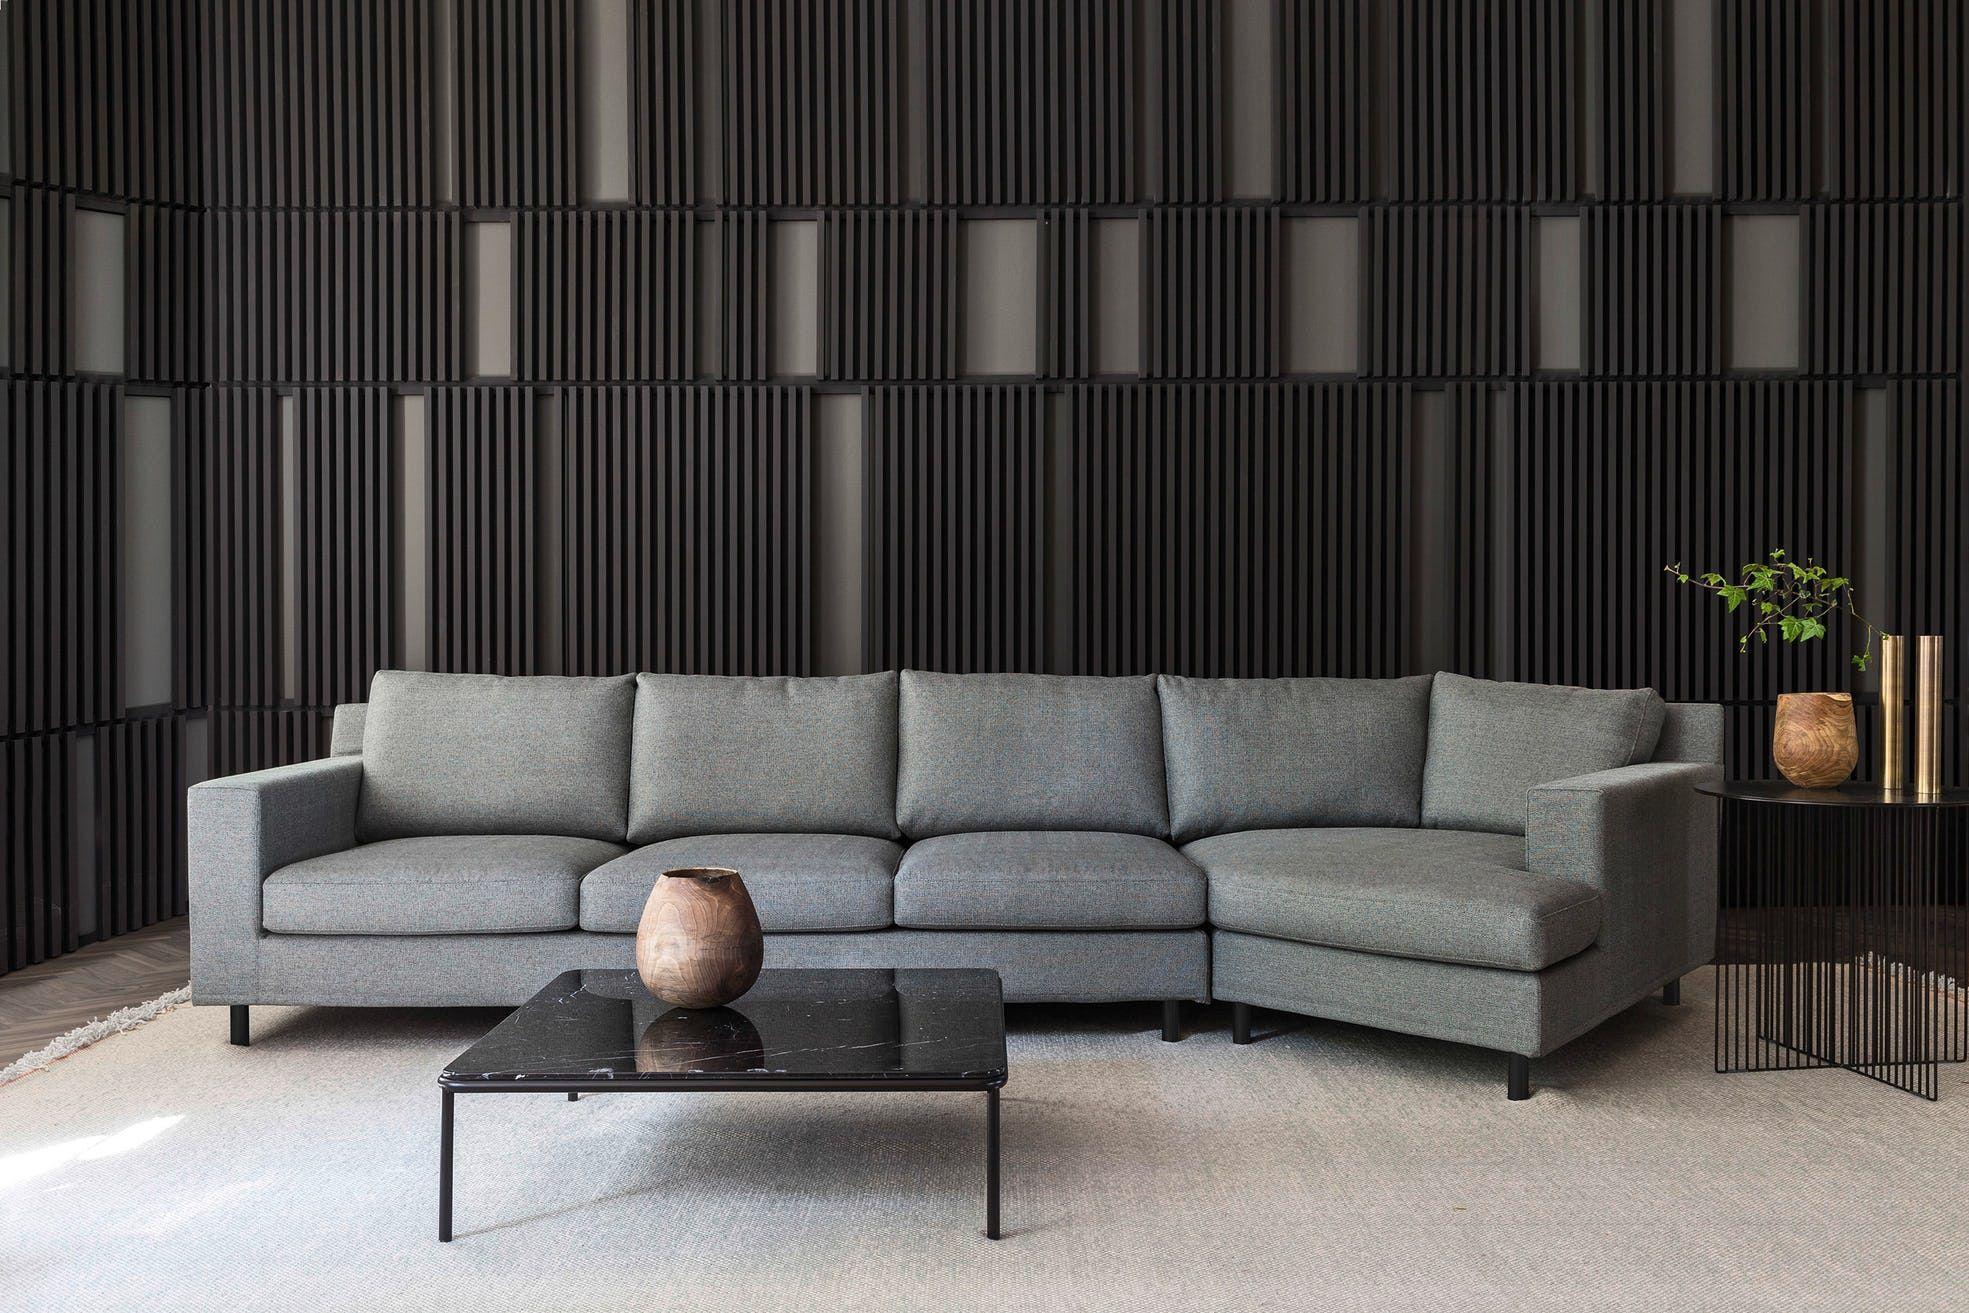 Manhattan Sofa By La Cividina Living Room Design Modern Furniture Design Modern Contemporary Furniture Design